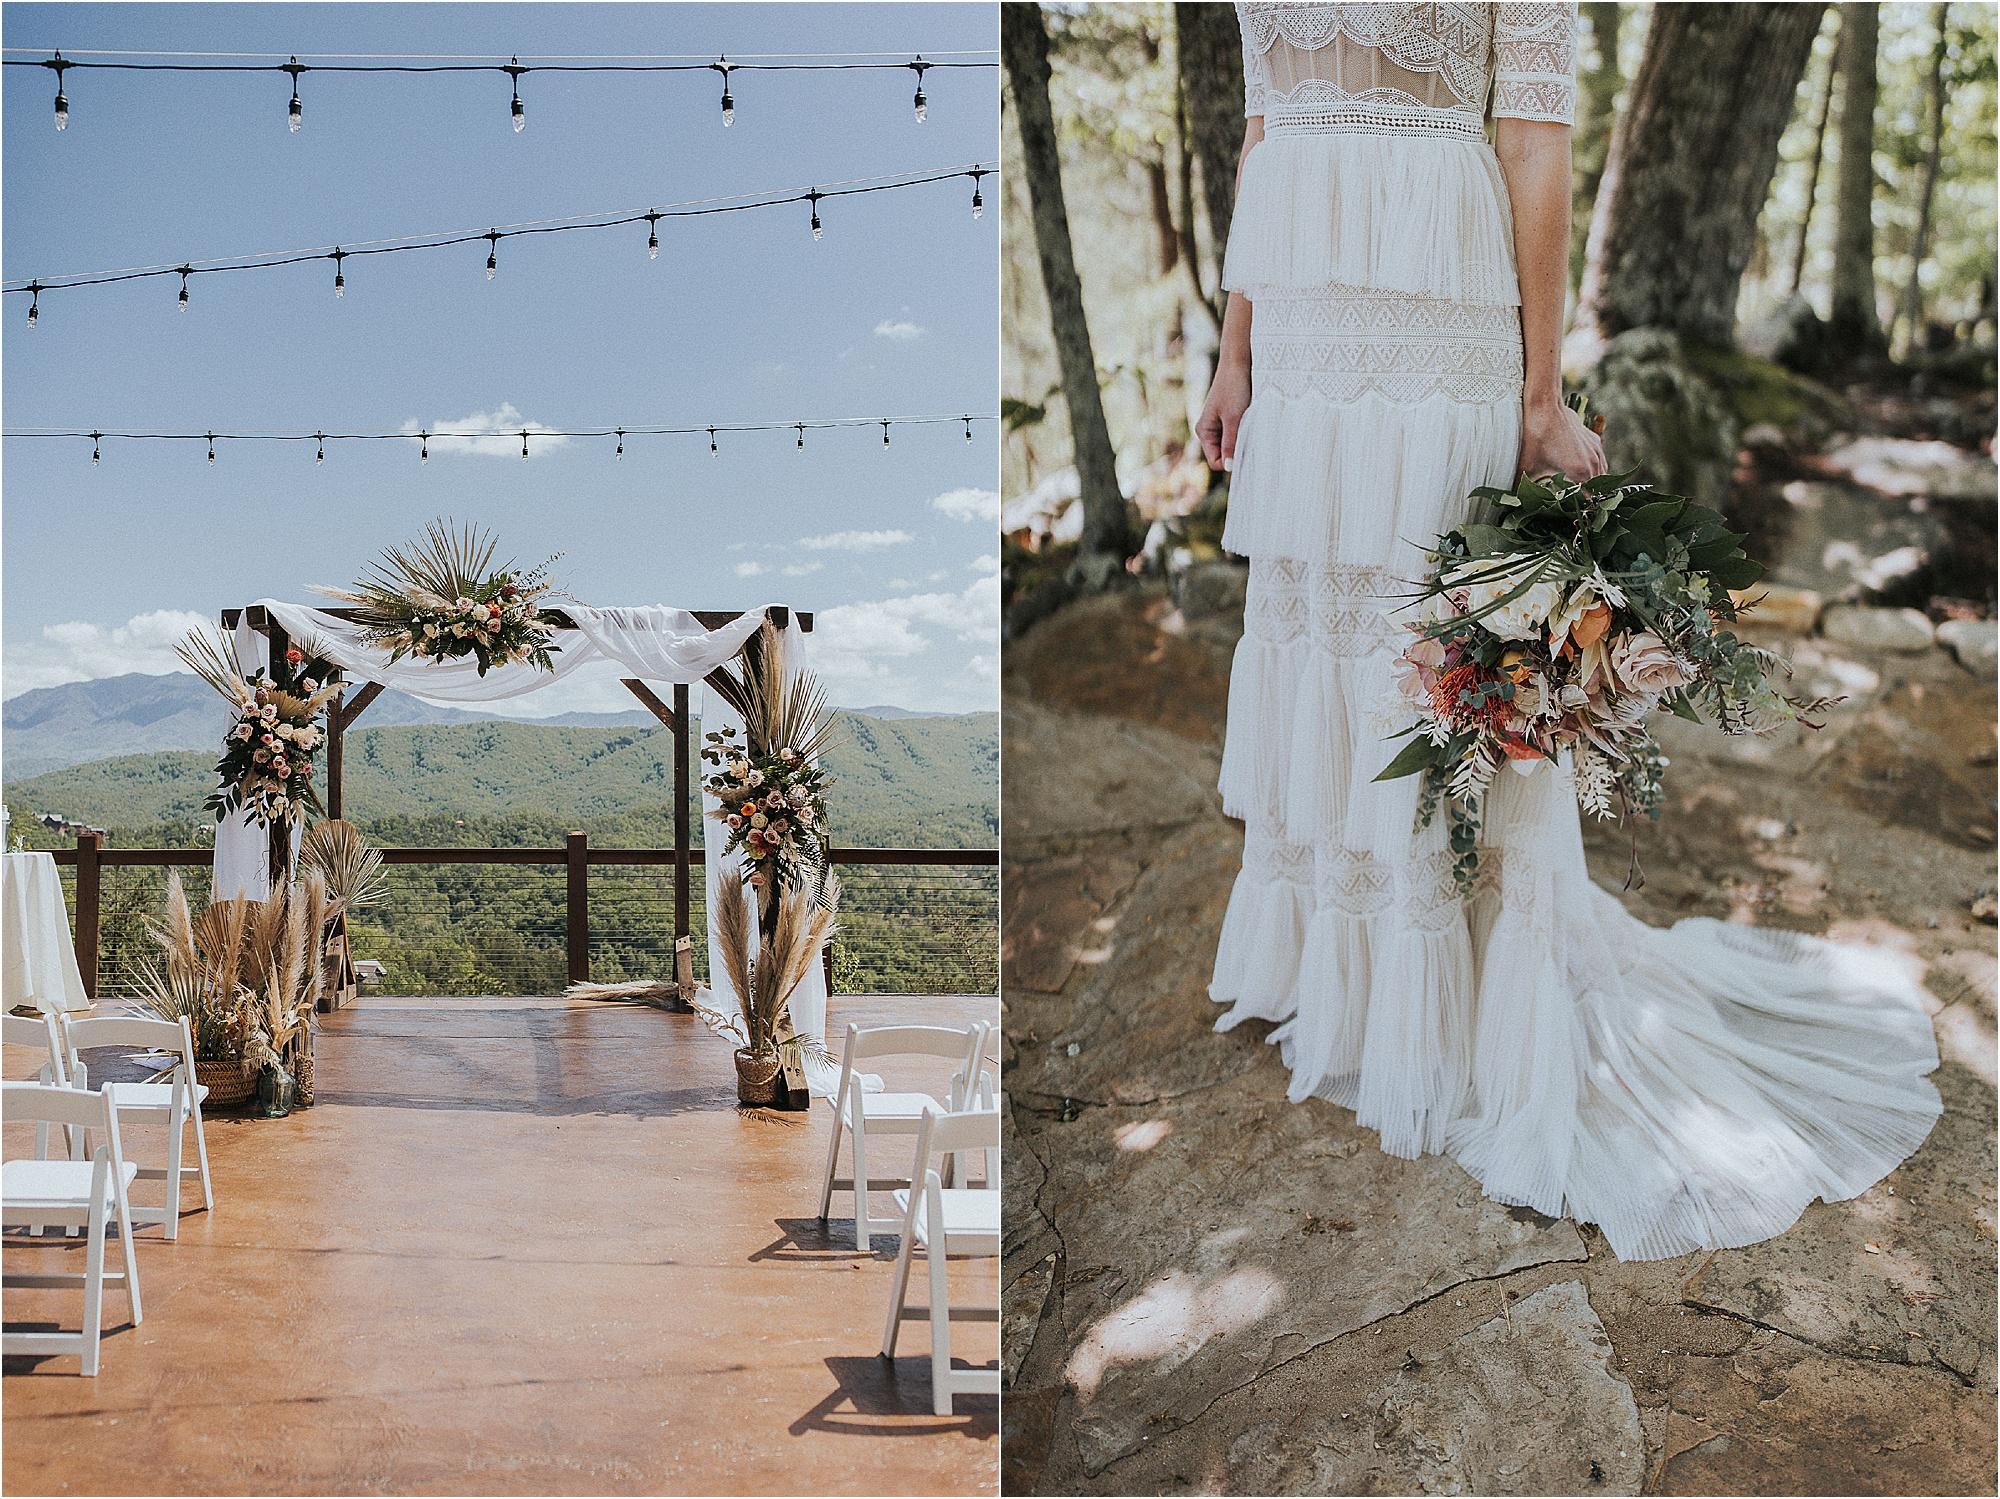 Huppah Jewish Wedding Canopy